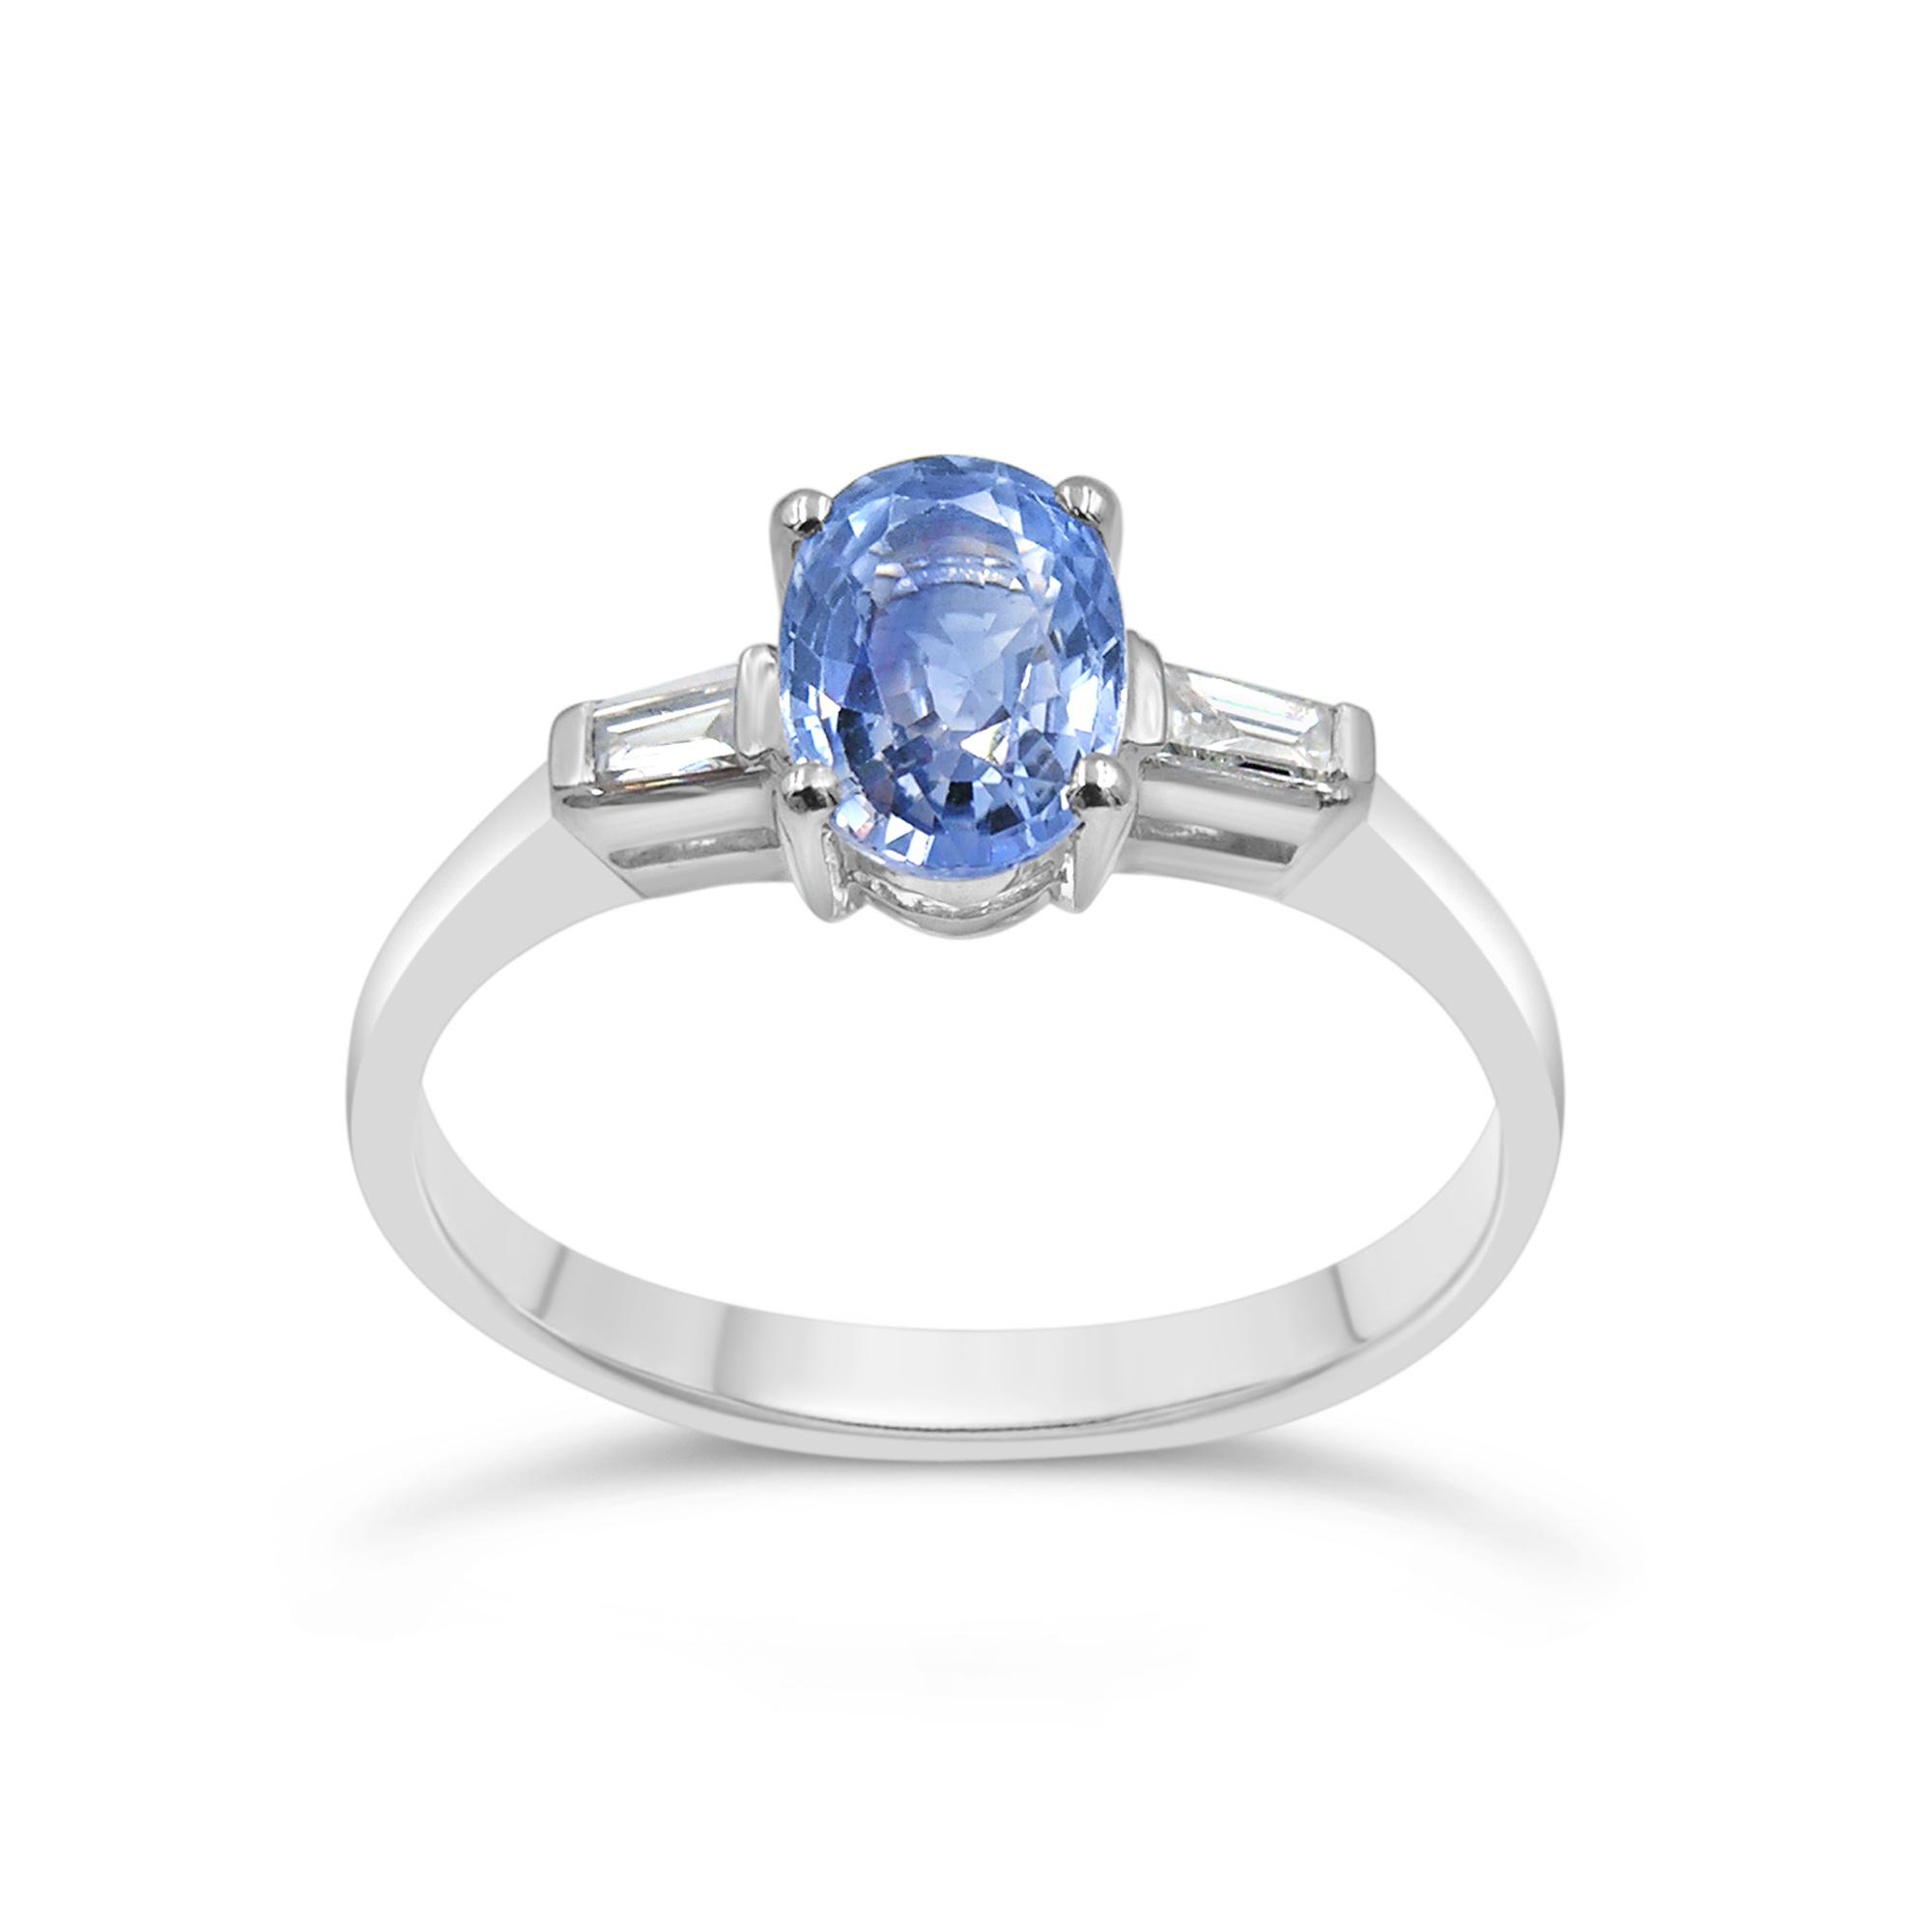 18 karat white gold ring with 0.16 ct diamonds  & 0.87 ct sapphire